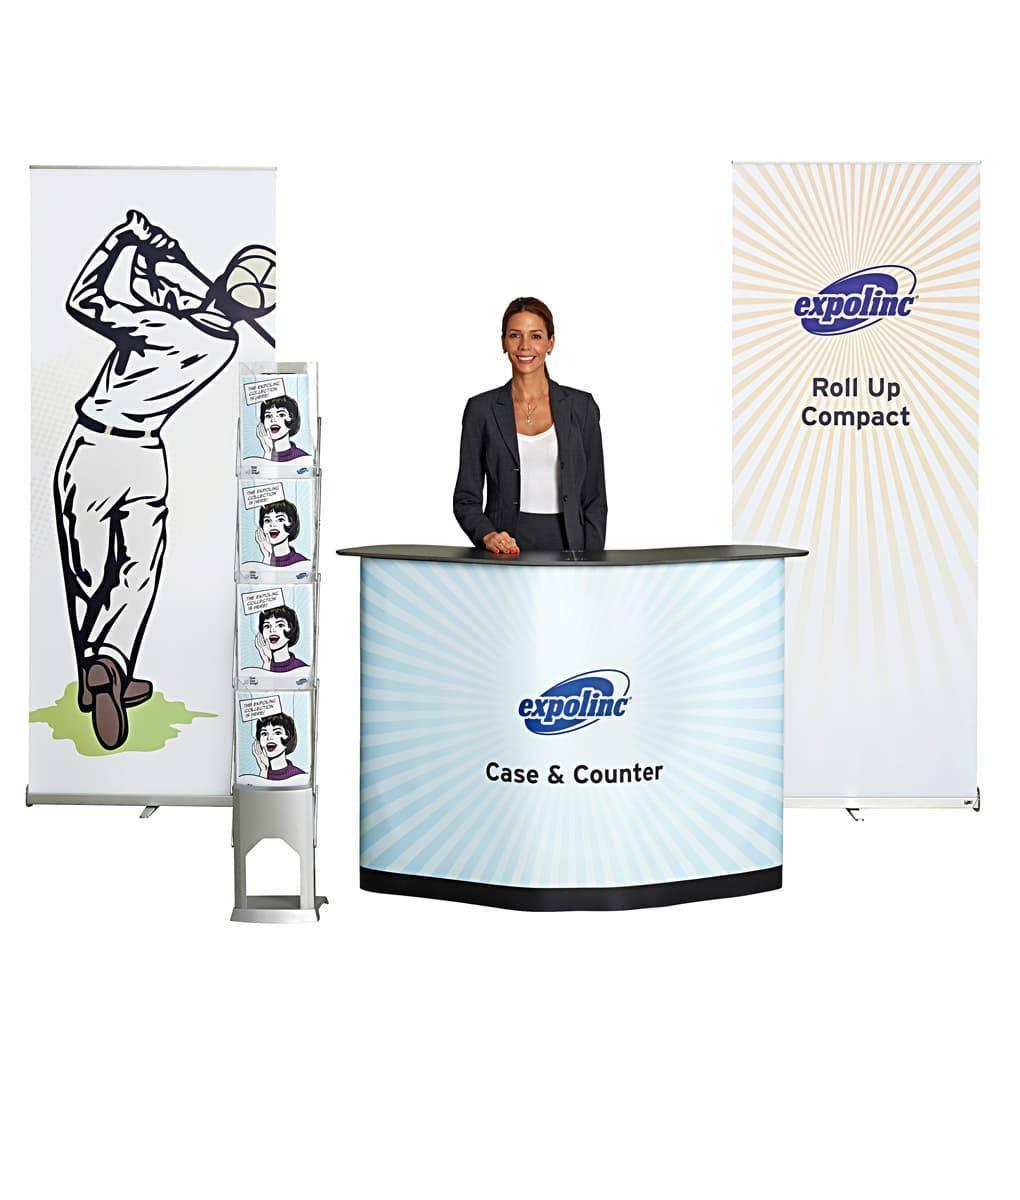 Case & Counter, Roll up Compact en BrochureStand